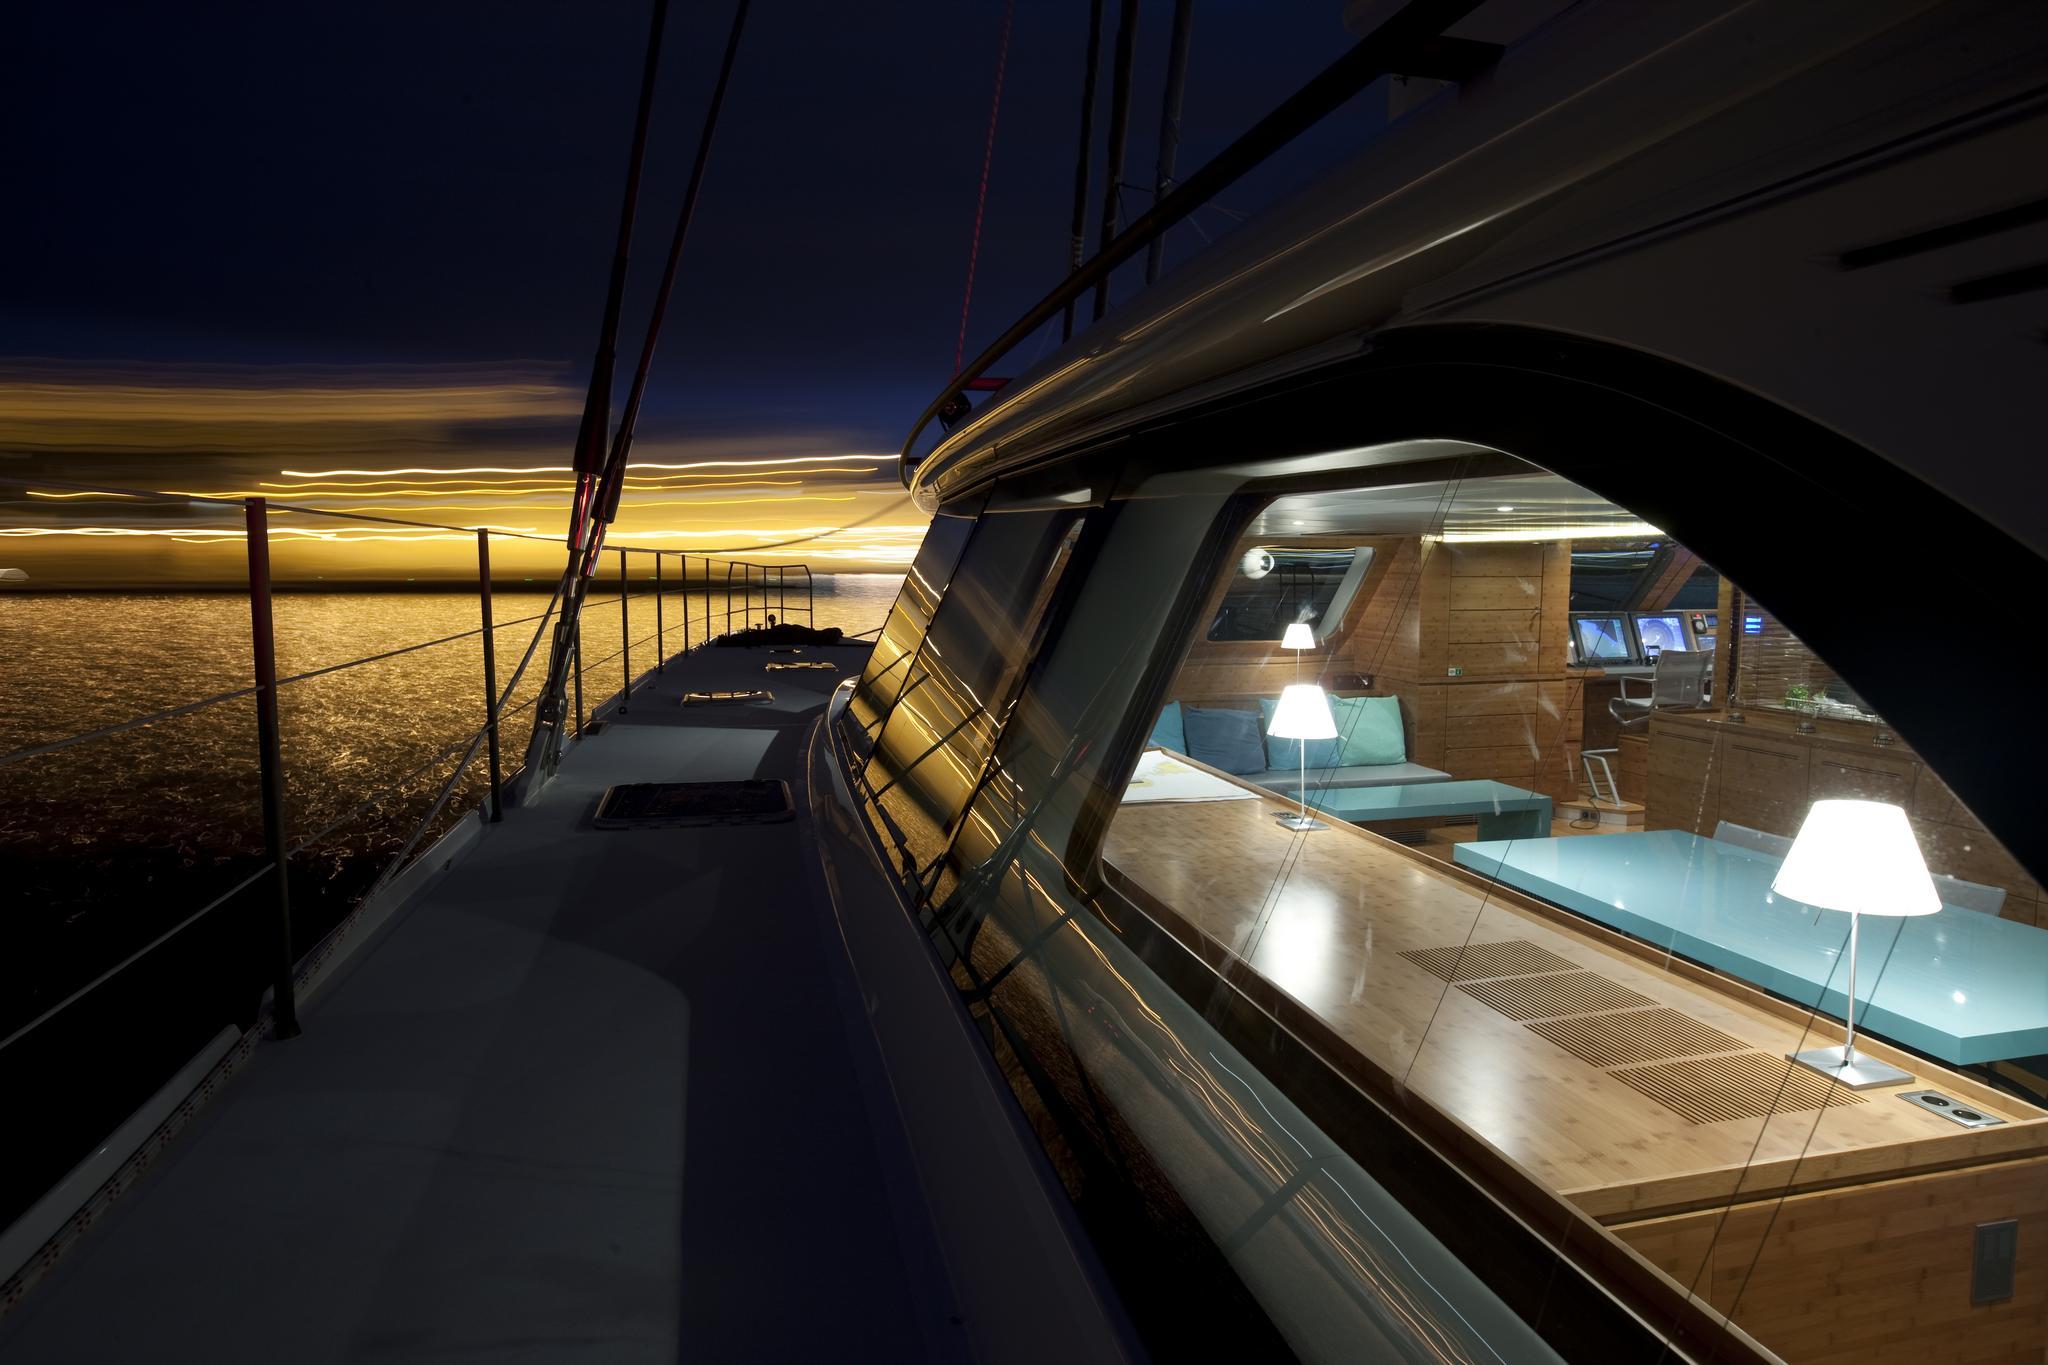 Launched Sail Catamaran for Sale  Sunreef 114 Deck & Equipment